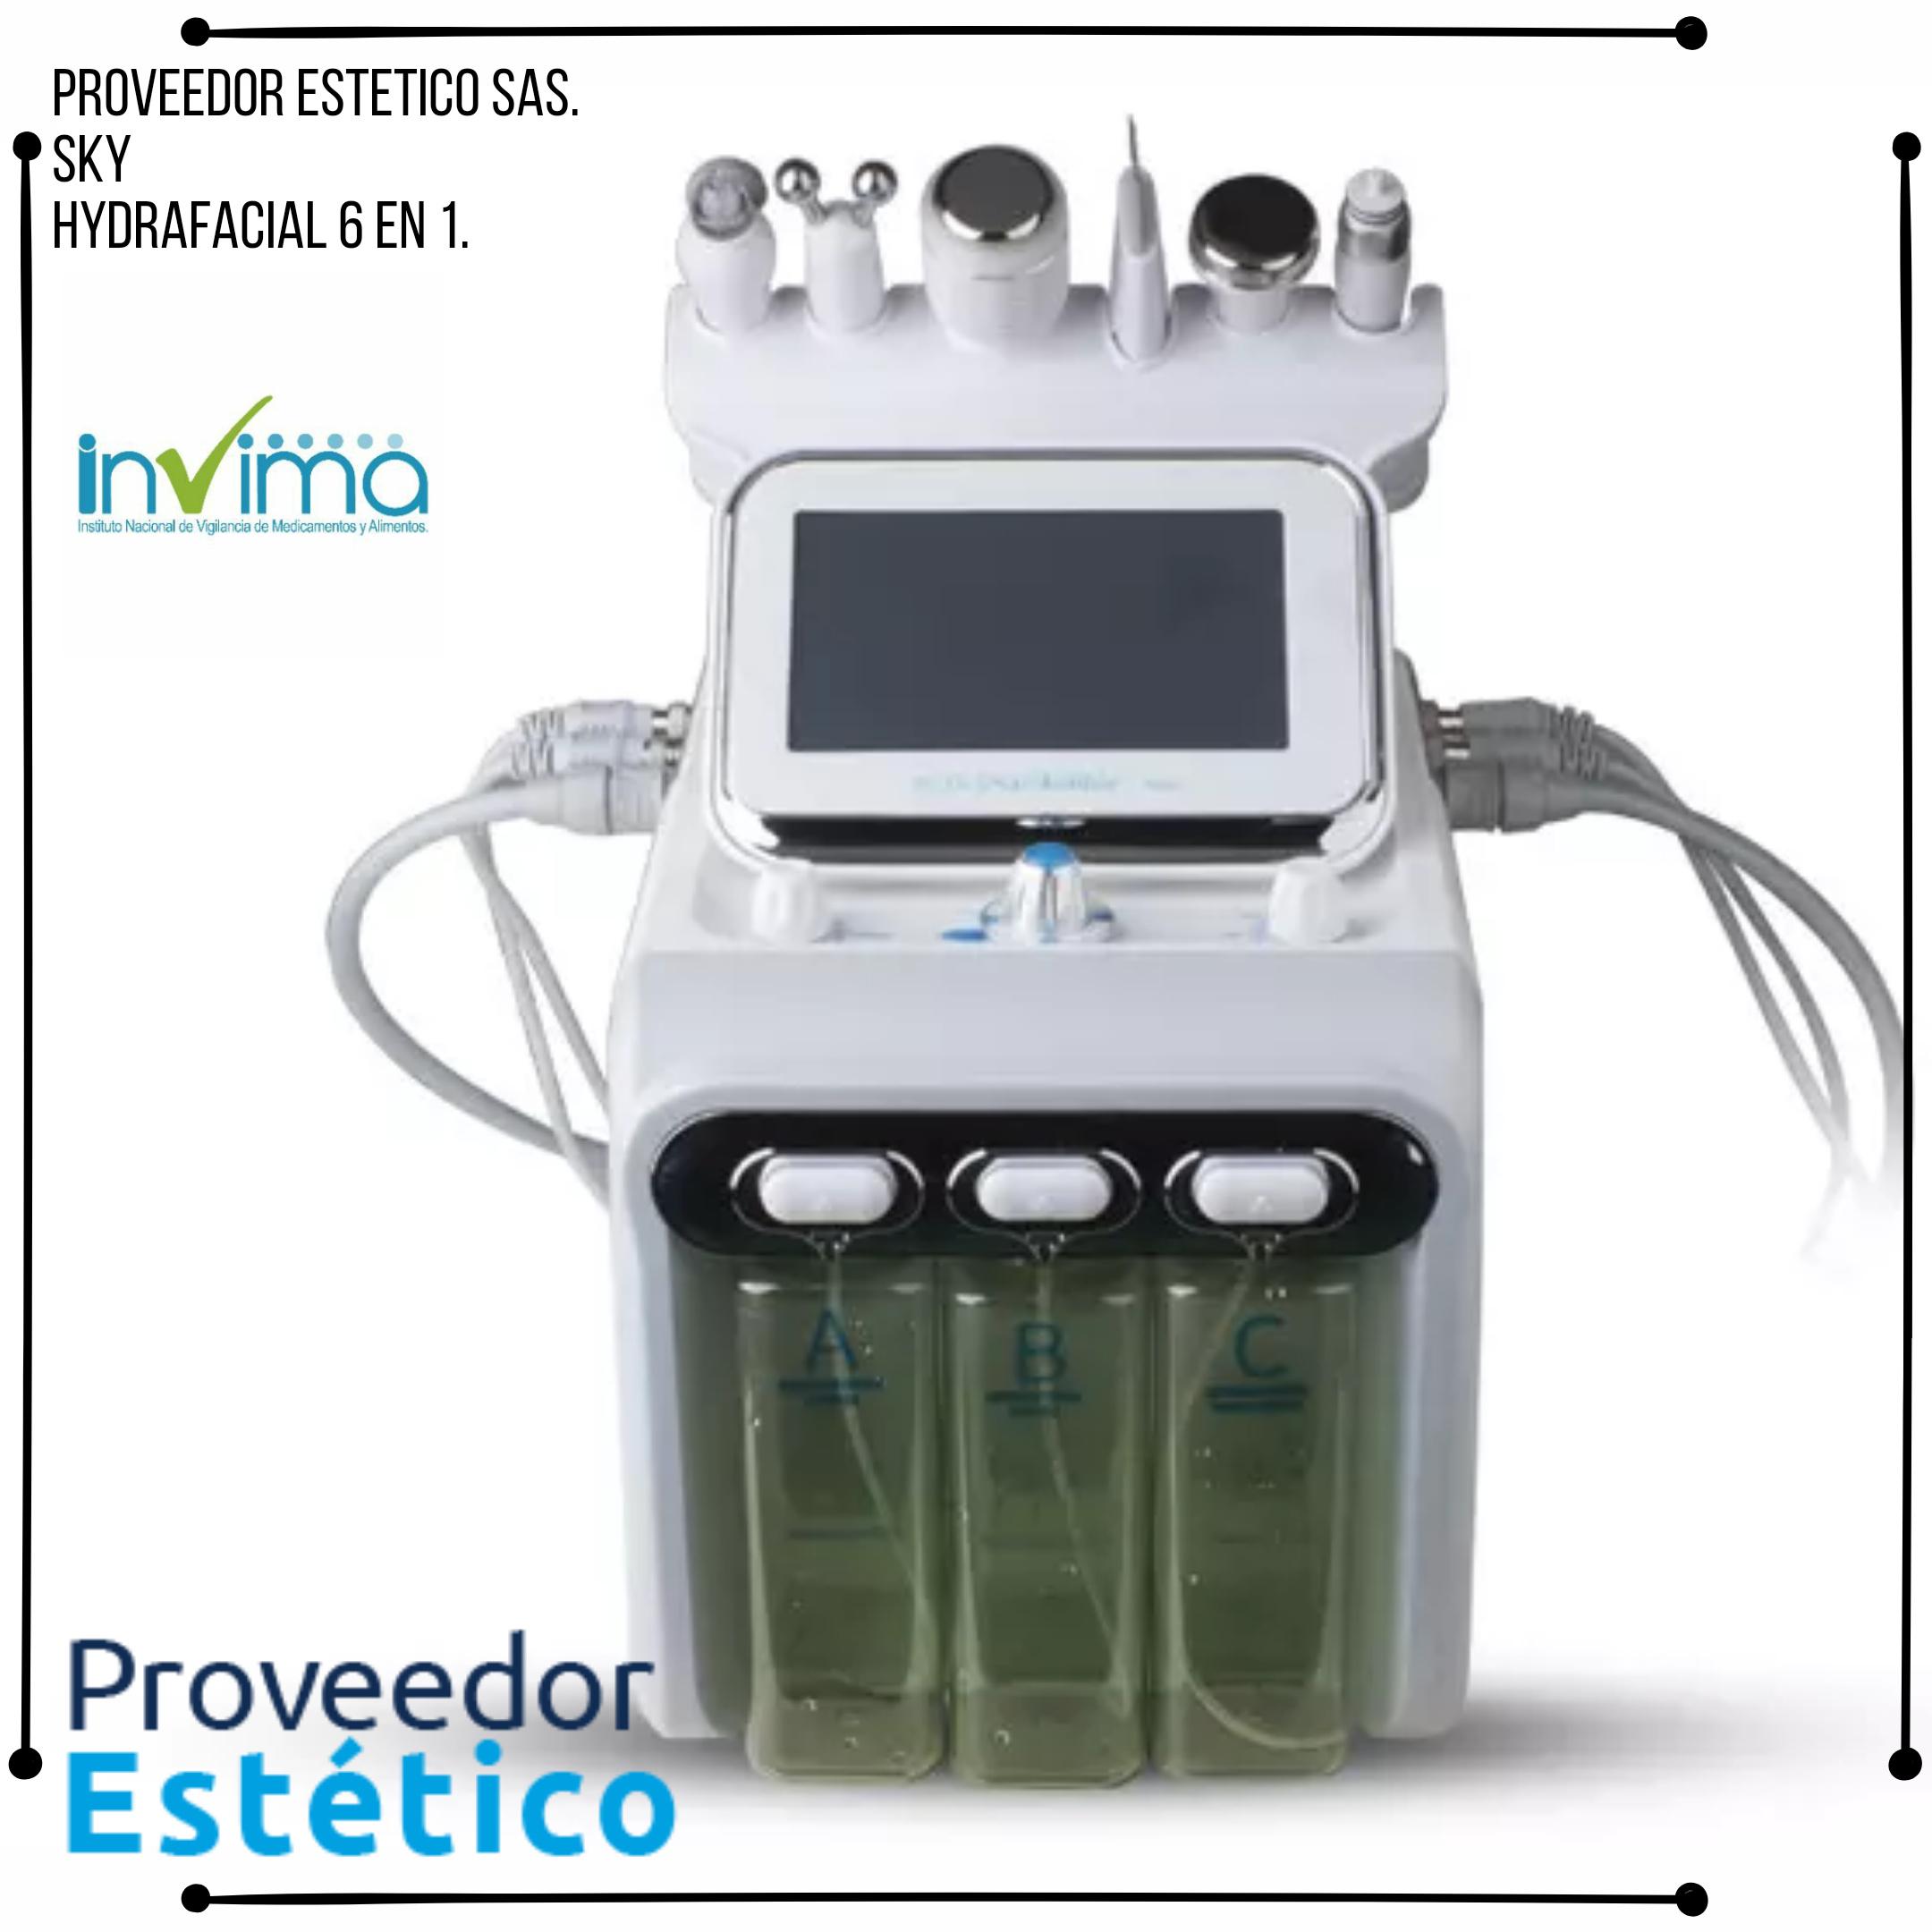 https://0201.nccdn.net/1_2/000/000/18c/355/Hydrafacial-Nuevo-Modelo-_1-2160x2160.jpg